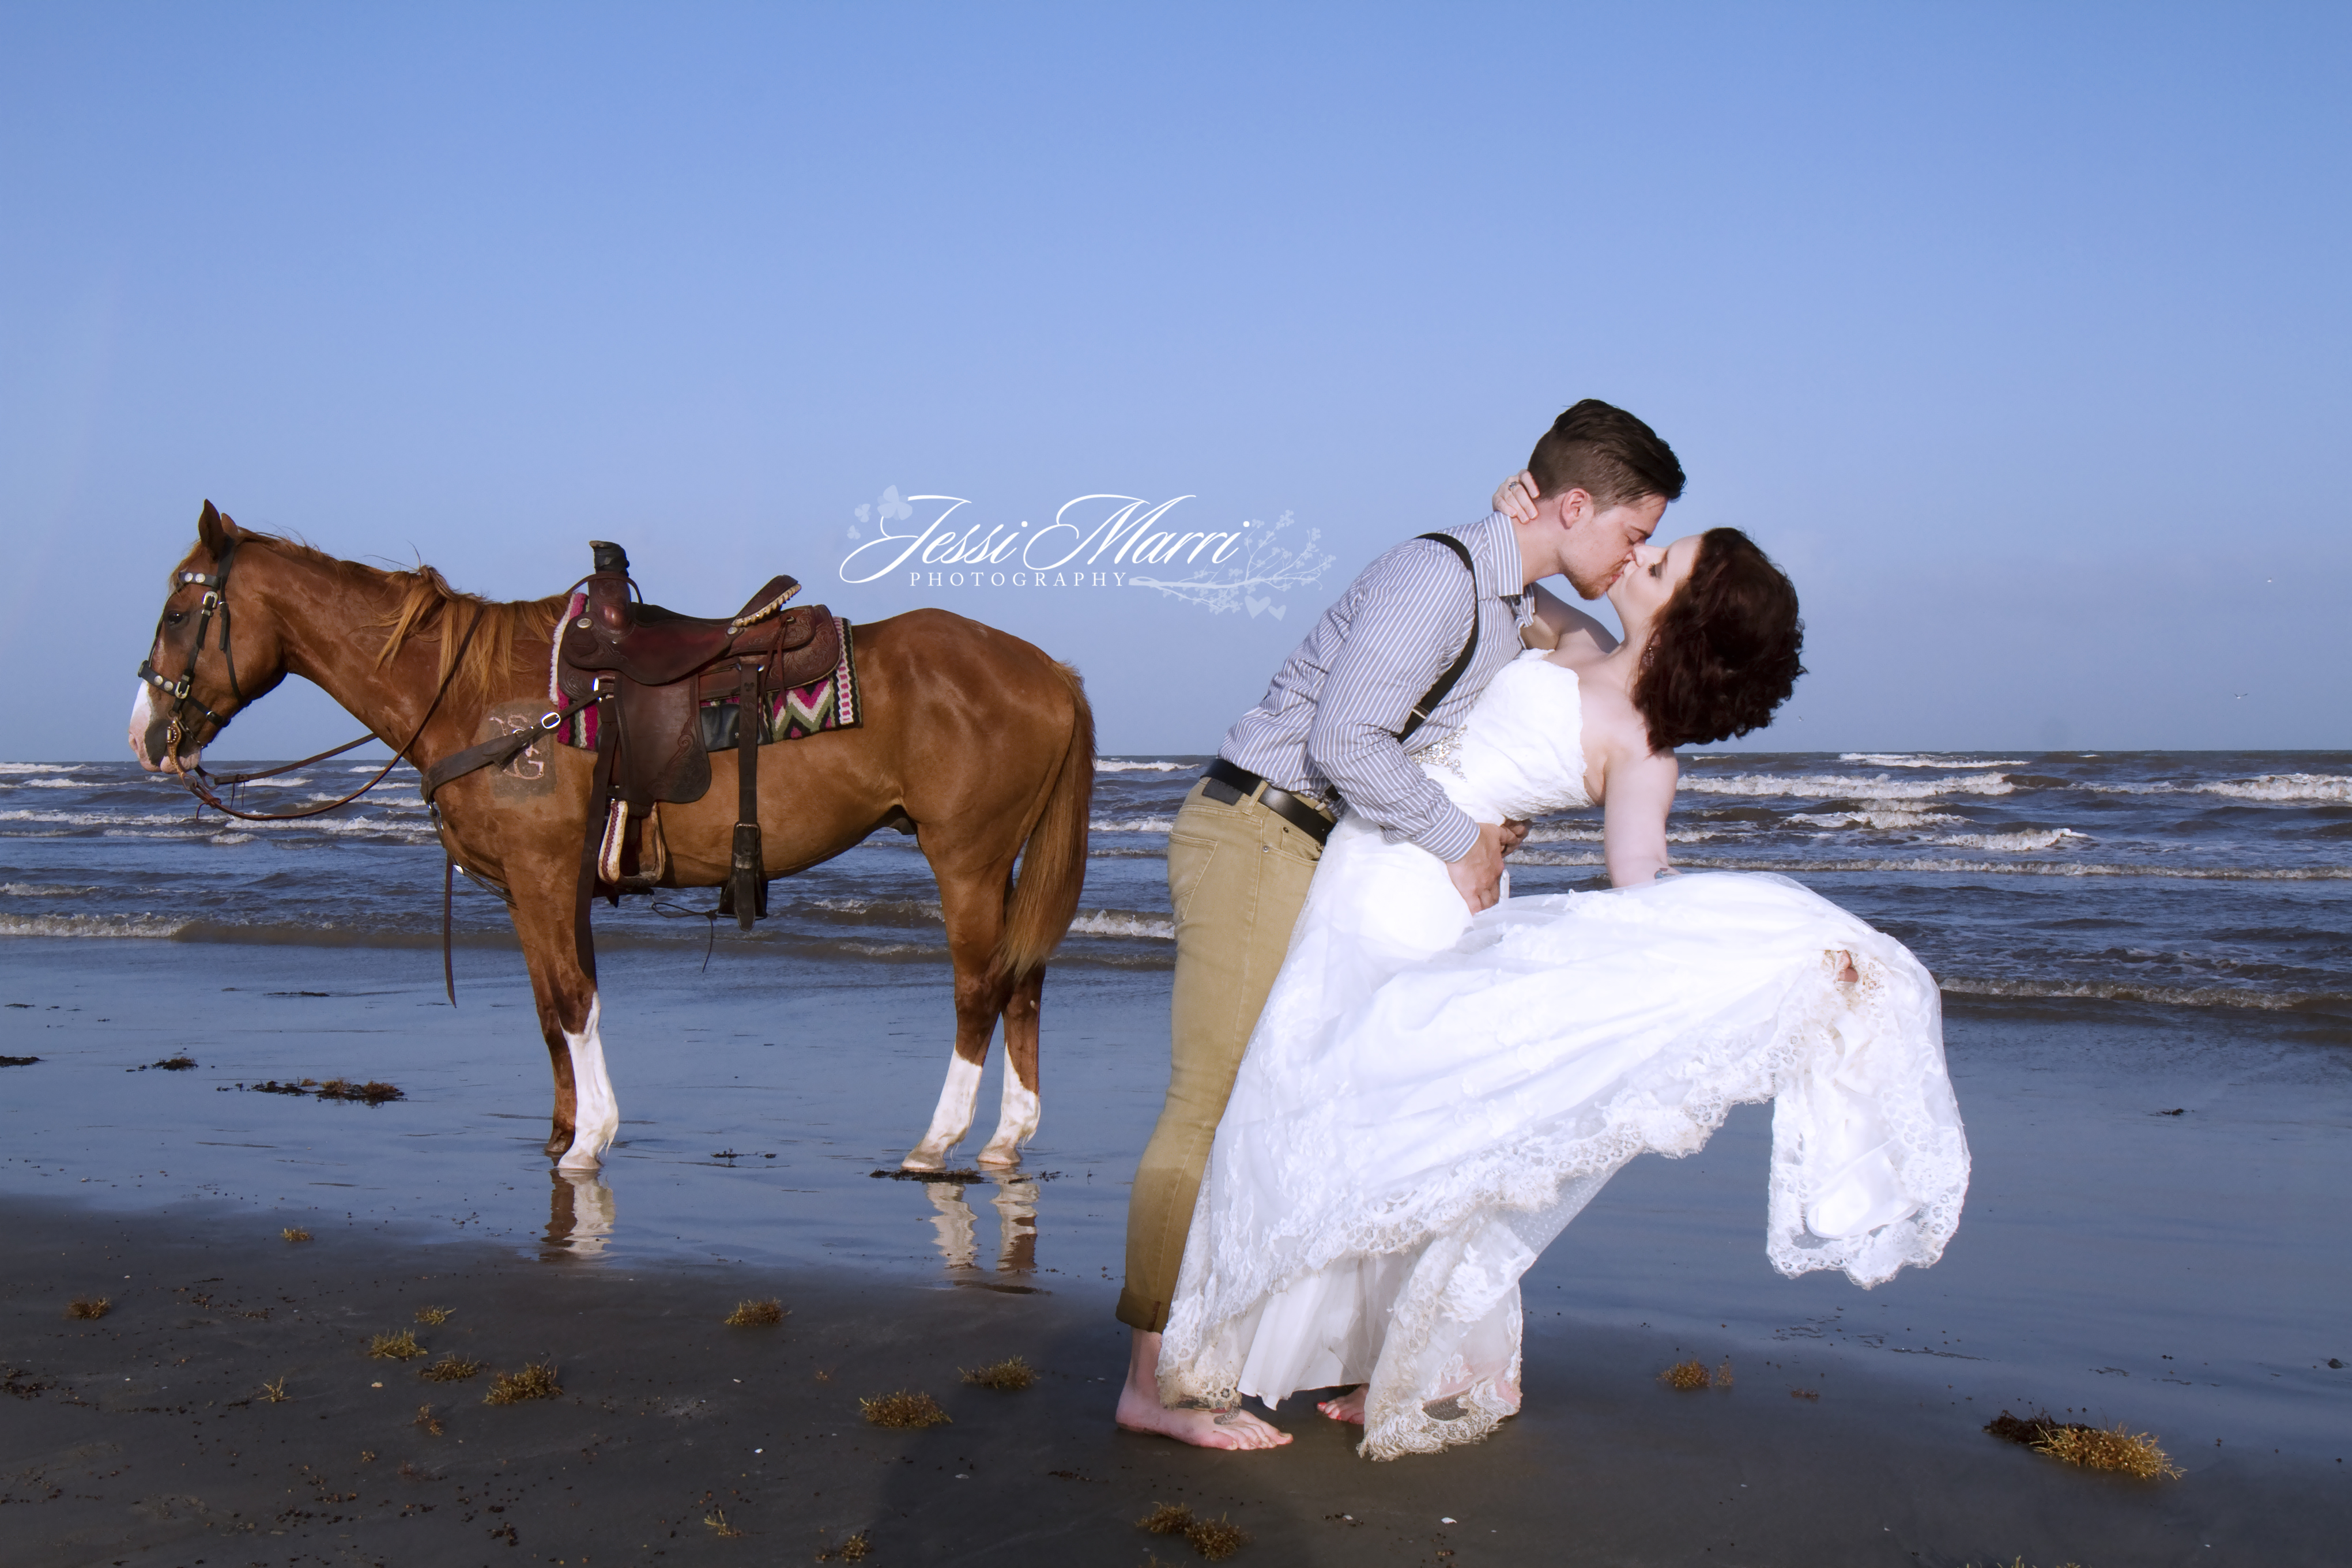 Horseback Riding On The Beach Wedding Horseback Riding On The Beach Photography